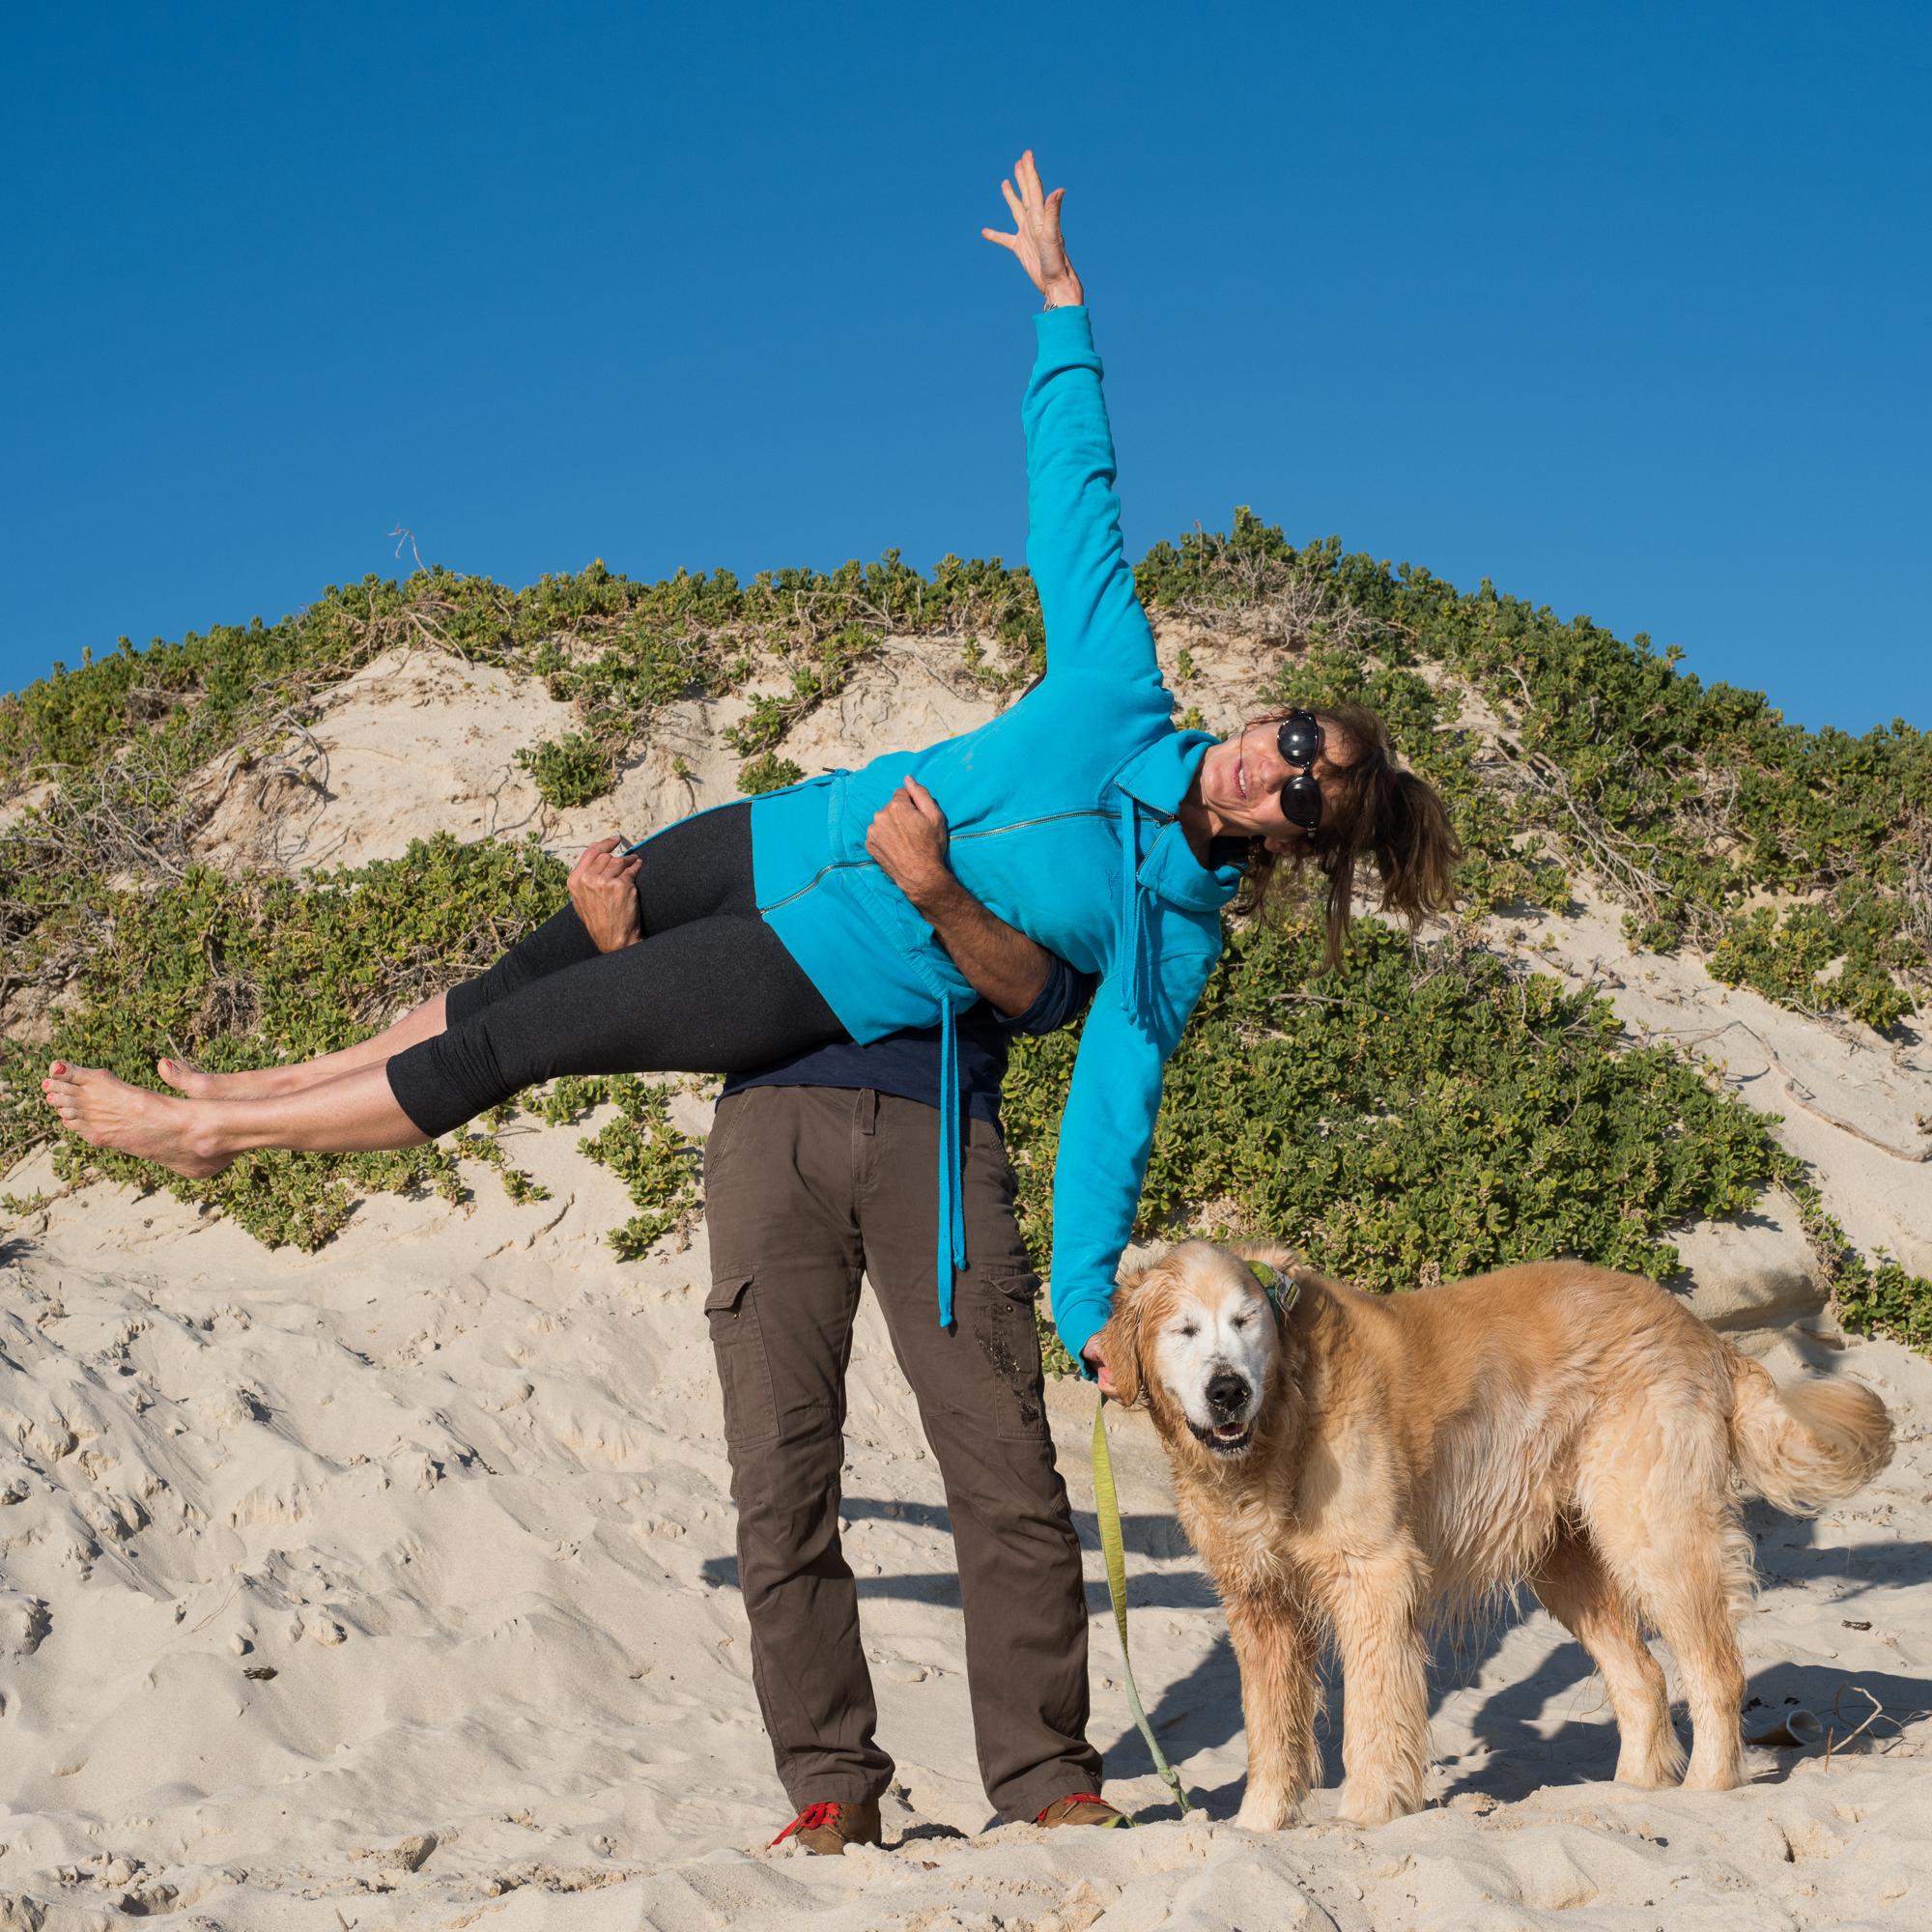 Dog_Beach_Perth_-_You_can't_teach_an_old_dog_new_tricks